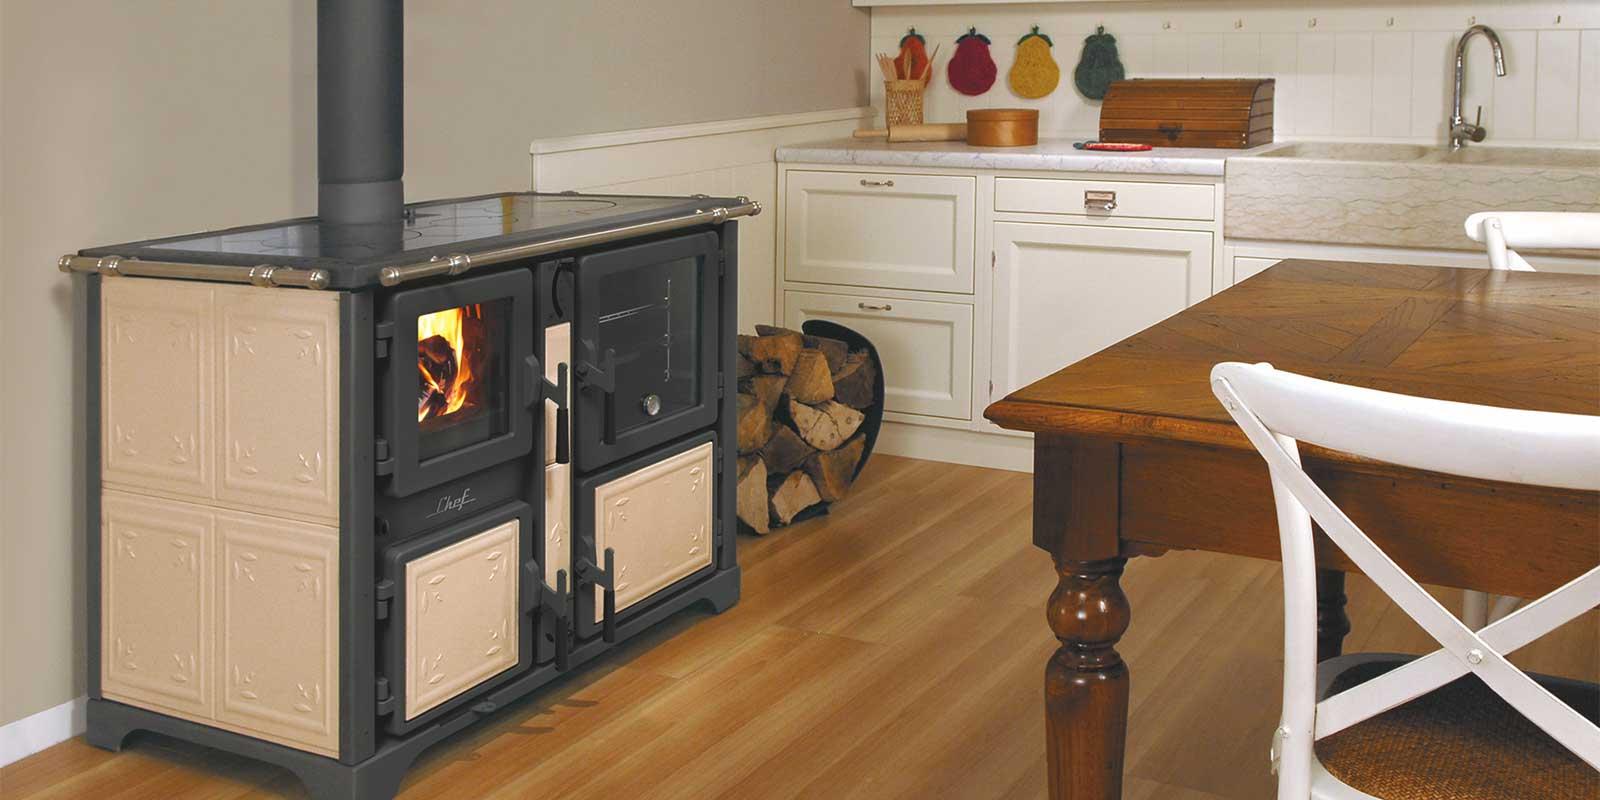 Caldaie stufe termocamini a legna e pellet tutto per il riscaldamento a legna e pellet - Termostufe a legna usate ...